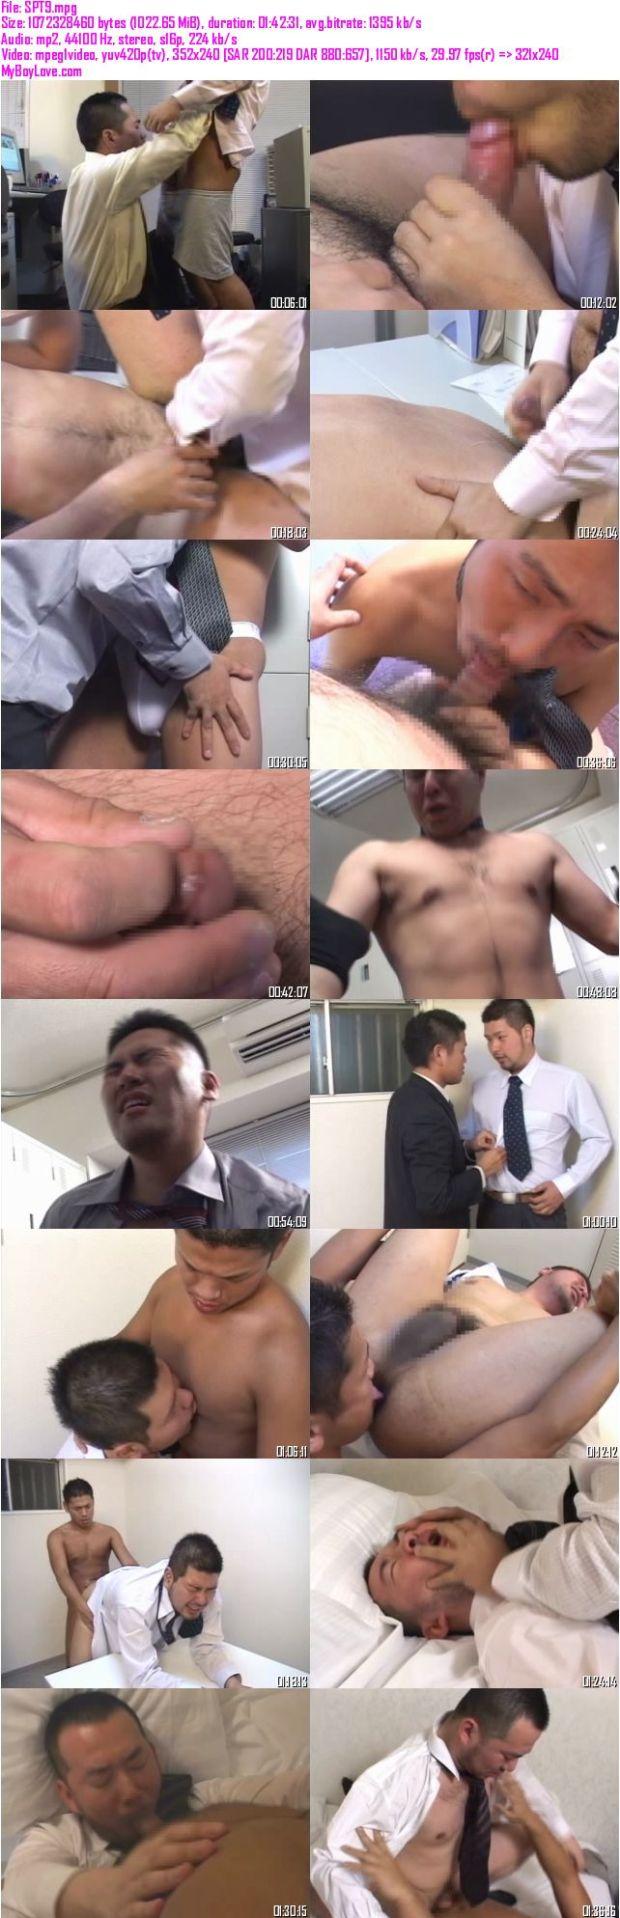 TYSON SPORTUS – スーツ淫悶雄漬け野郎